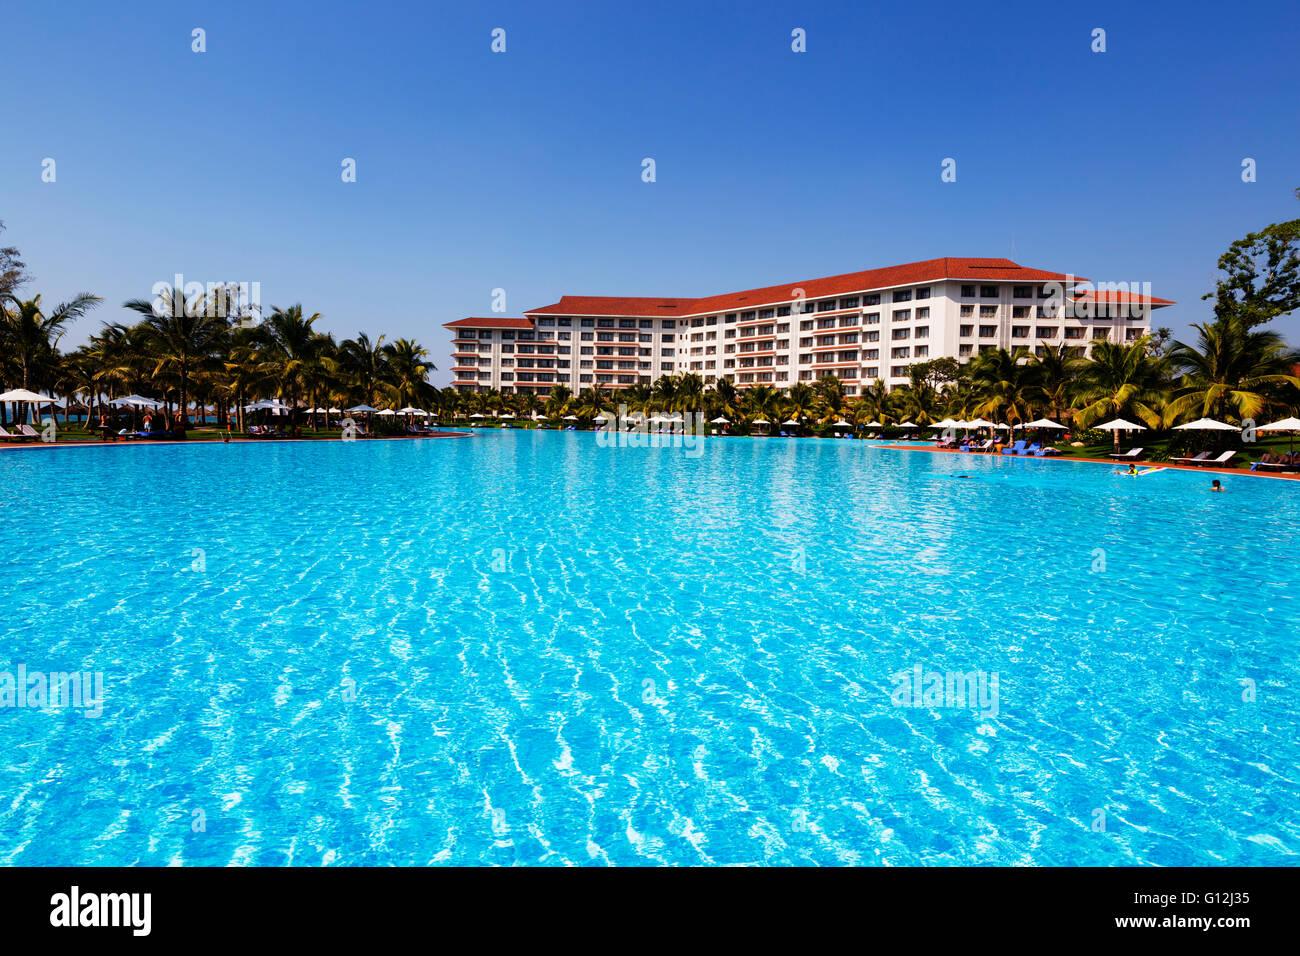 South East Asia, Vietnam, Phu Quoc island, Vinpearl Resort - Stock Image